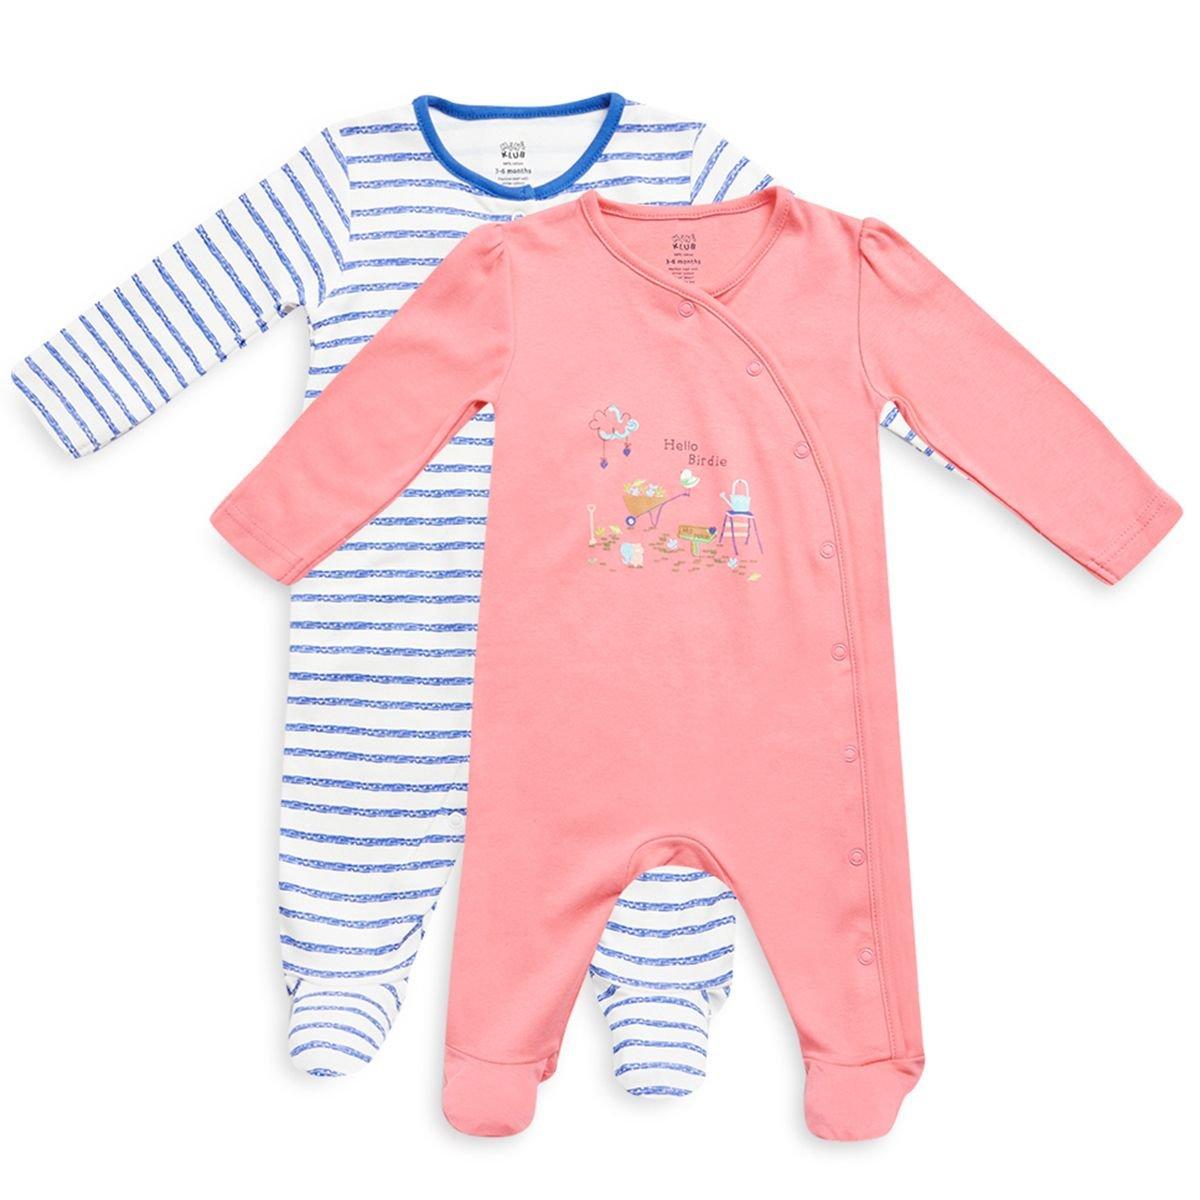 72330c793419 Mini Klub Boys Pack of 2 Sleepsuit with Full Sleeves  Amazon.in ...